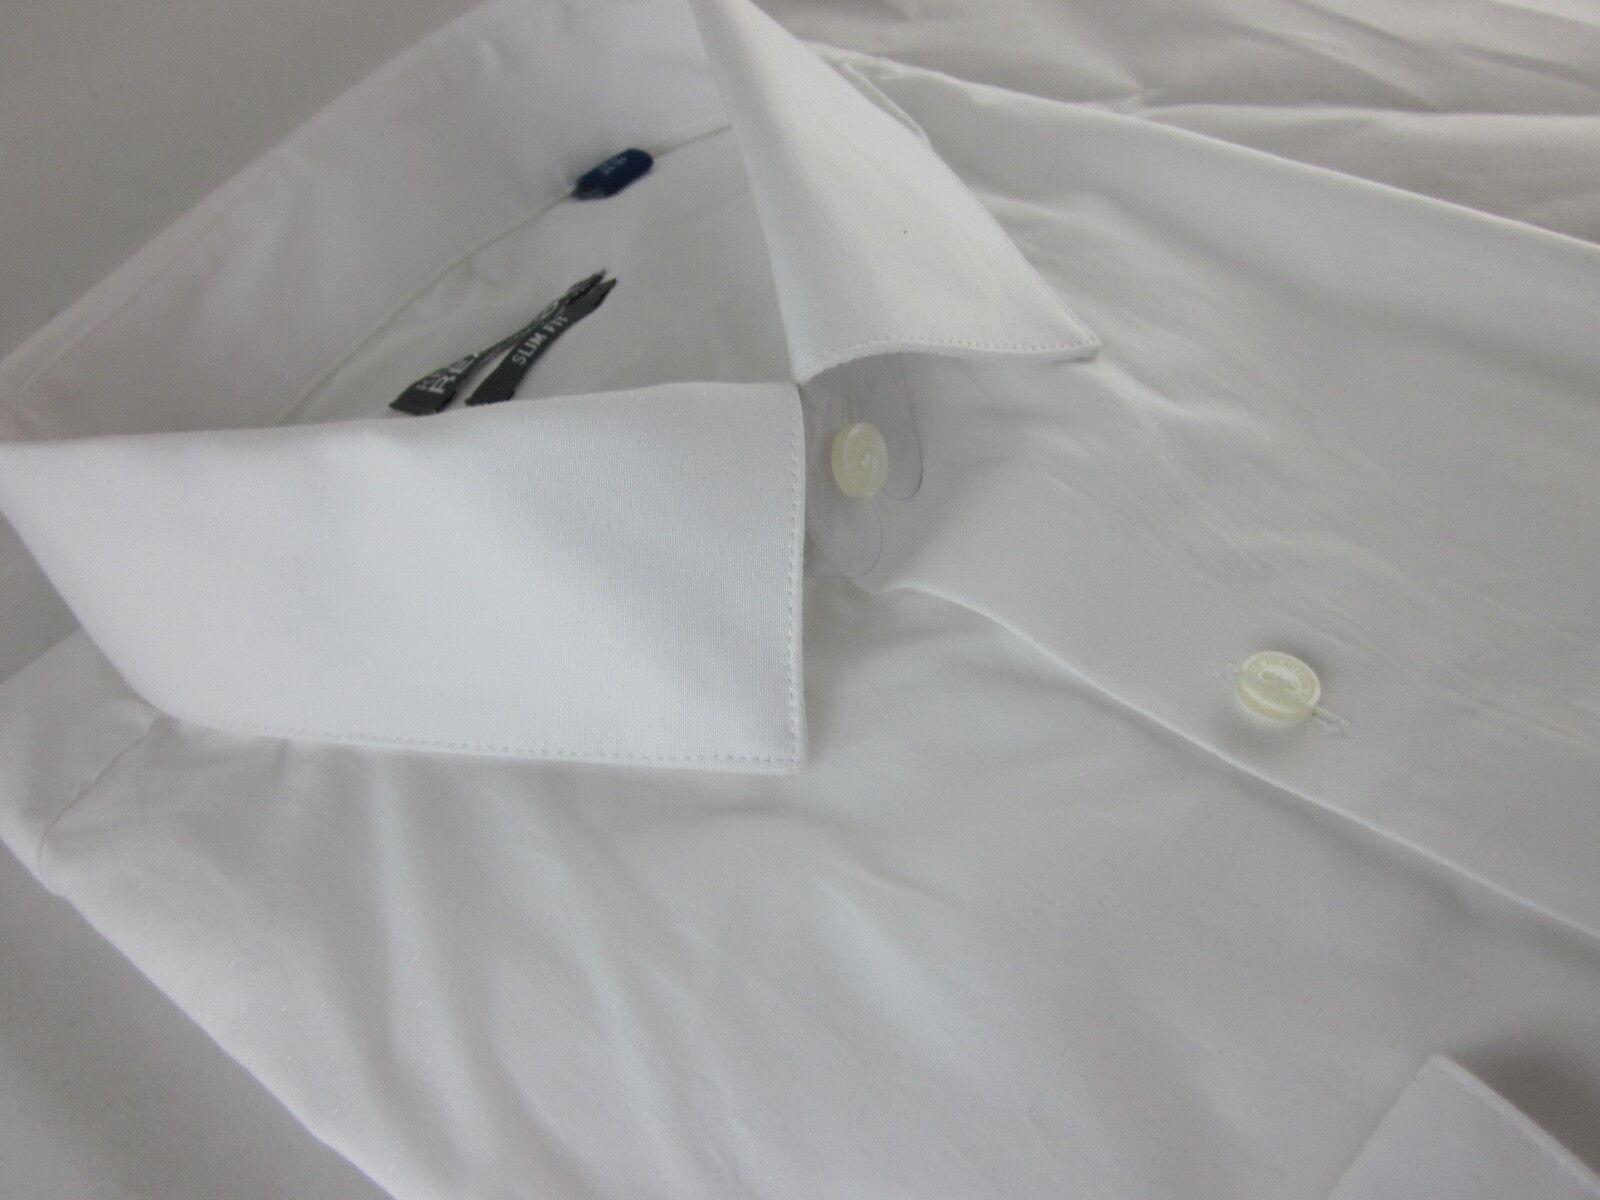 91df1242 NEW COLE REACTION DRESS SHIRT XLarge 34 35 Slim fit White NWT 17.5 KENNETH  nrqzdl5492-Dress Shirts